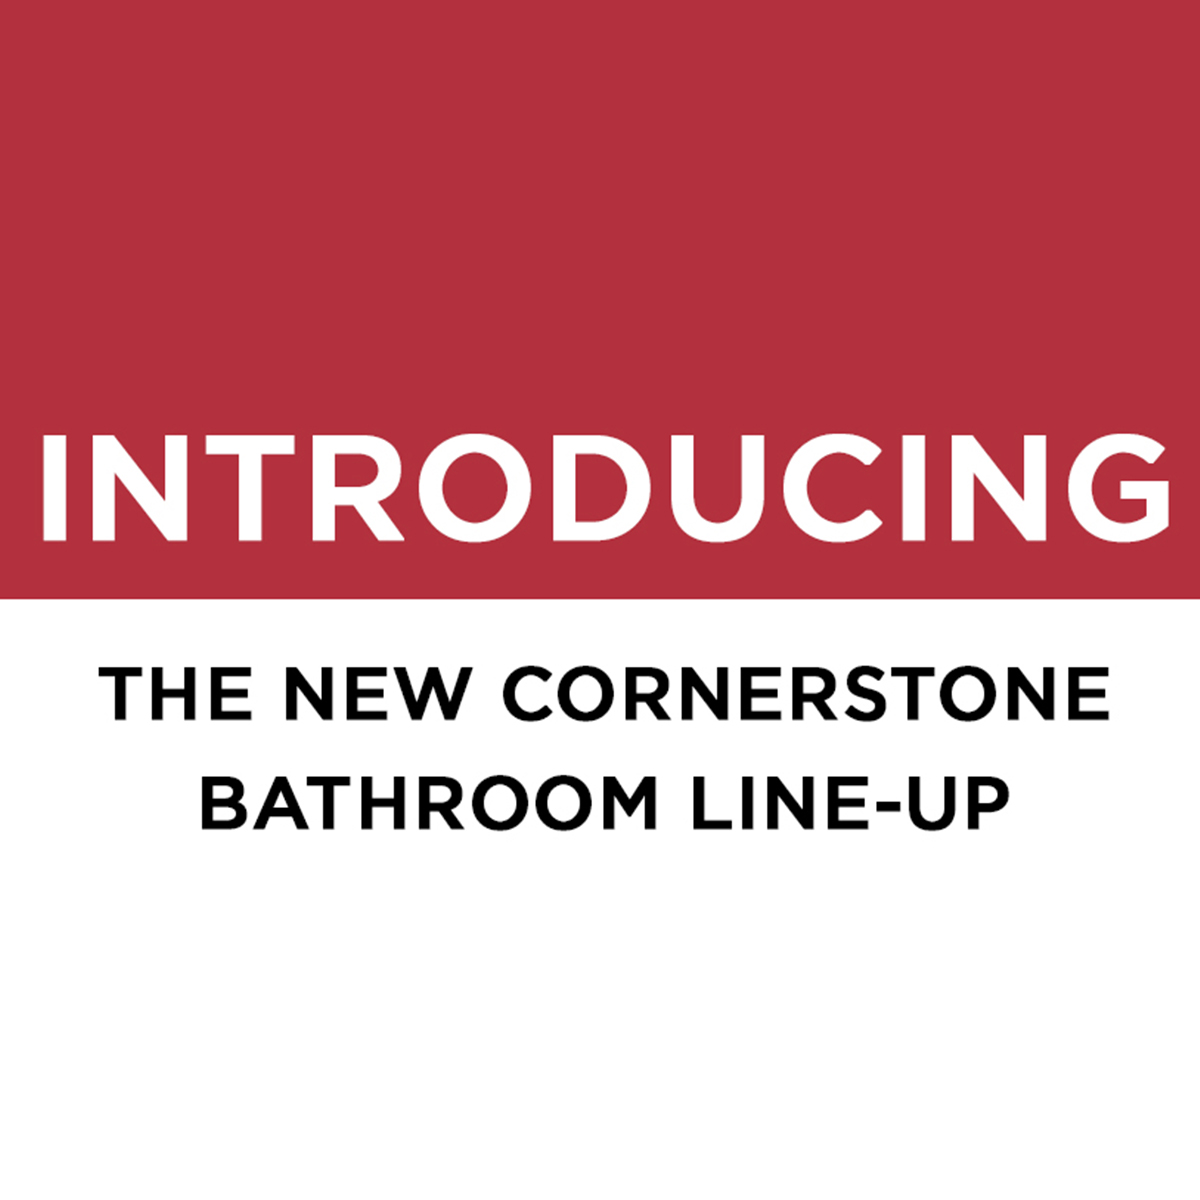 Introducing The New Cornerstone Bathroom Line-Up